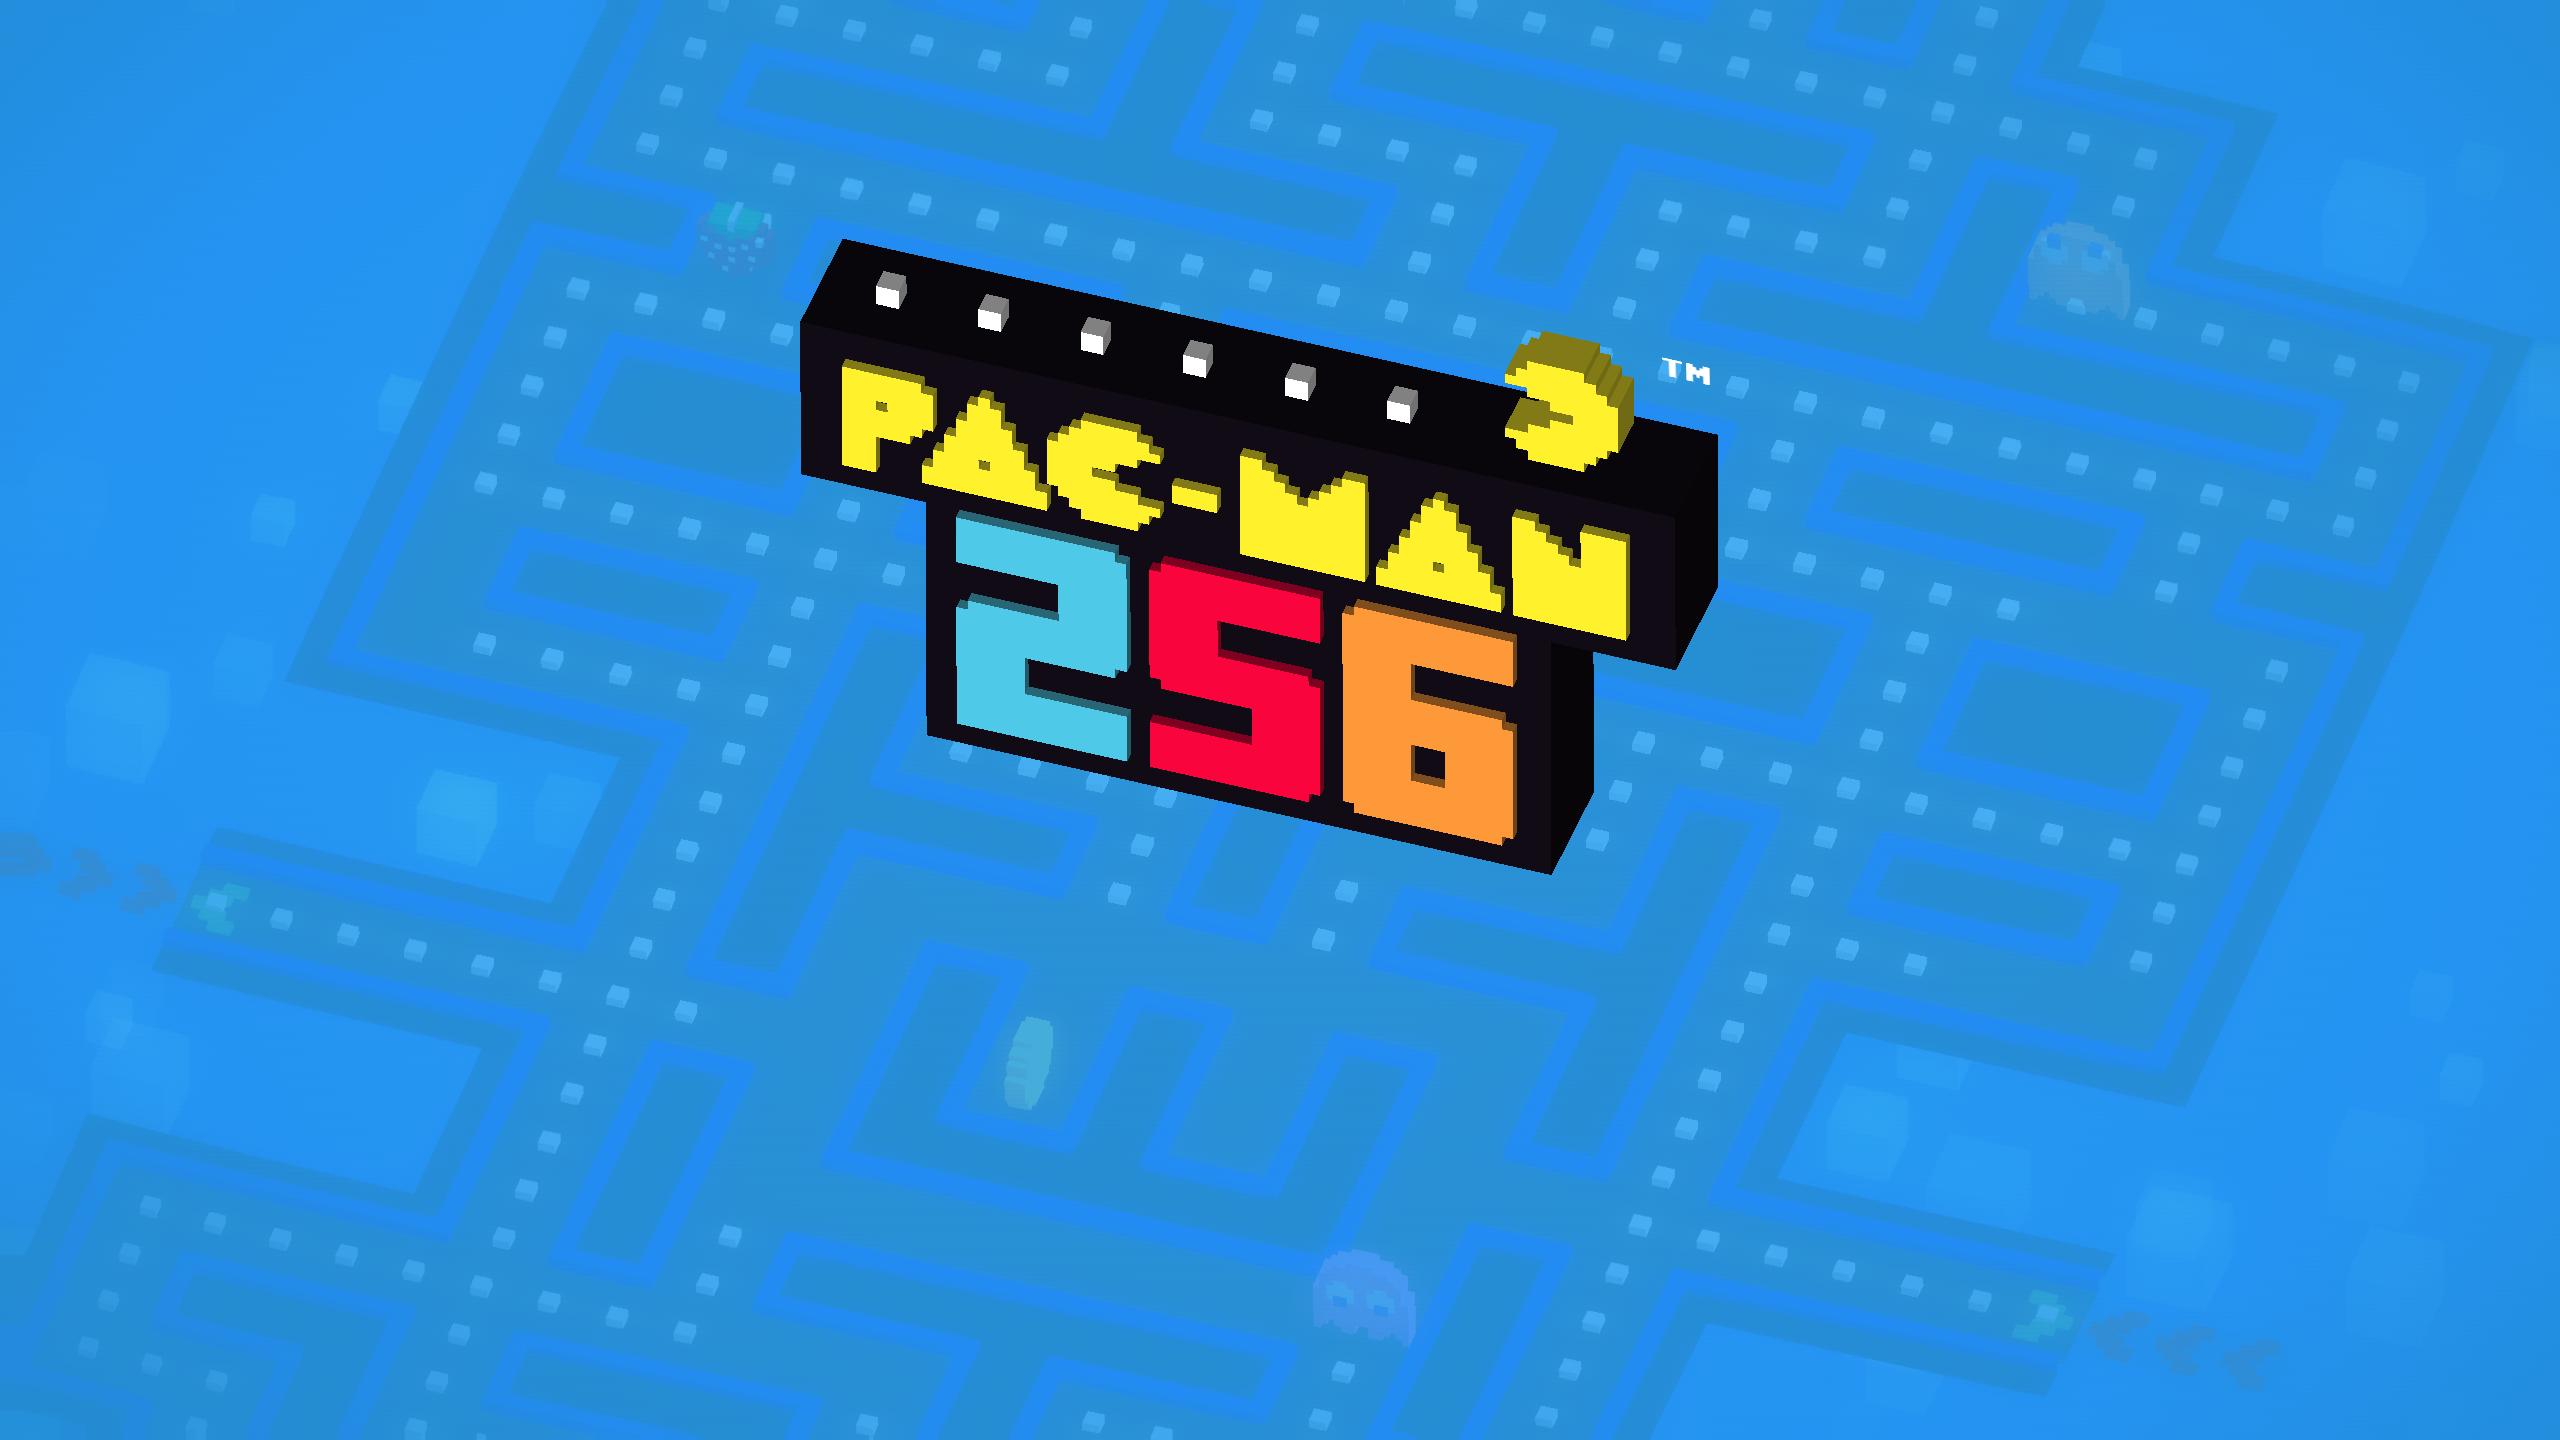 Pac-MAn 256 review, critiques, tests